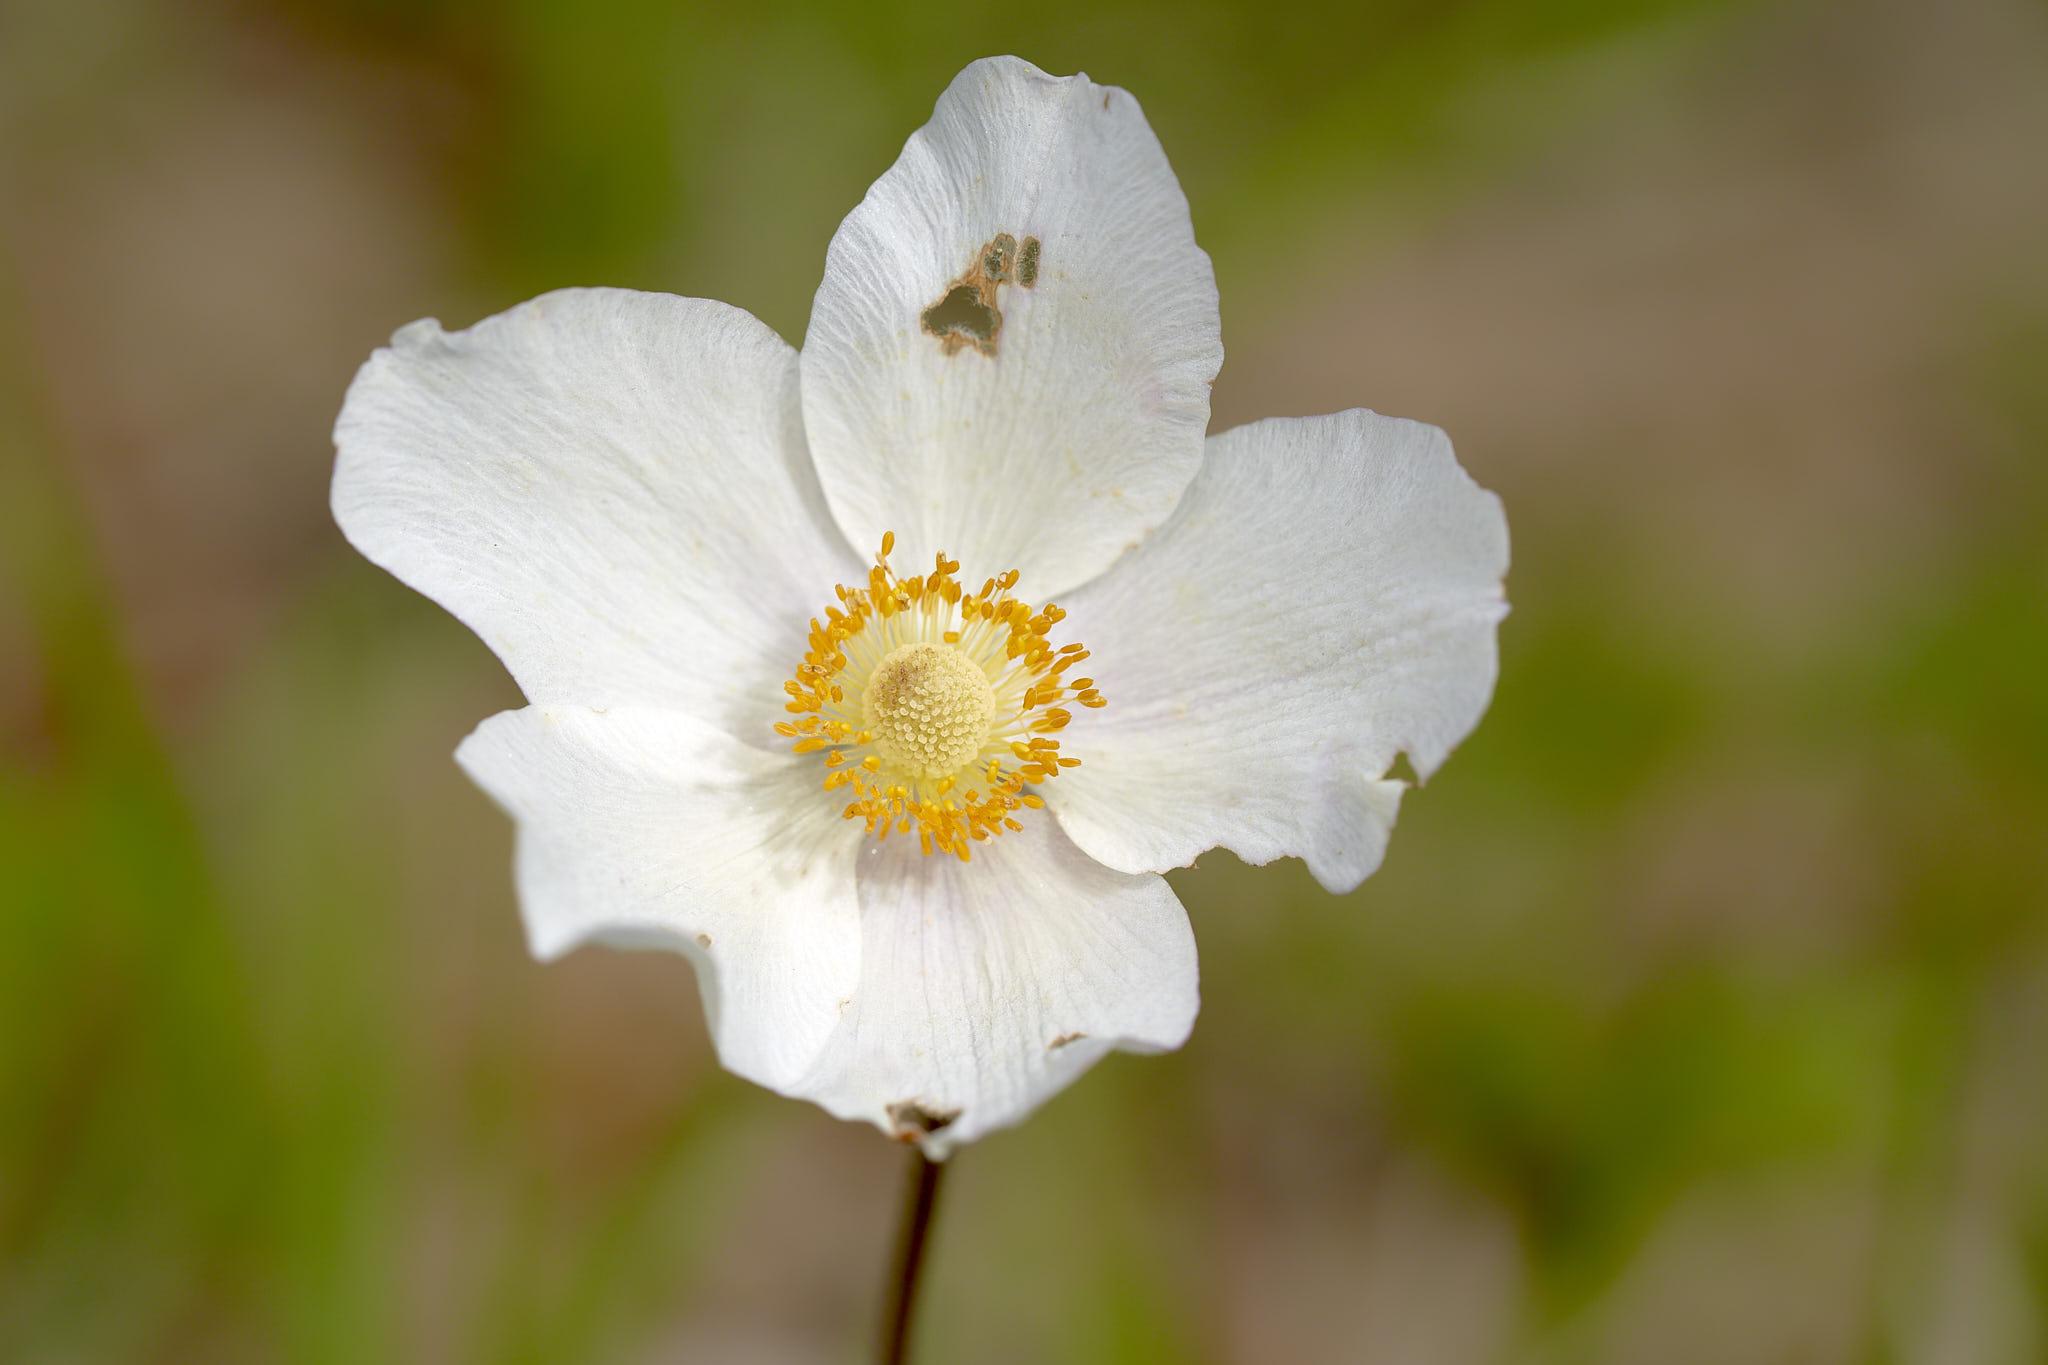 Grosses Windröschen (Anemone sylvestris)